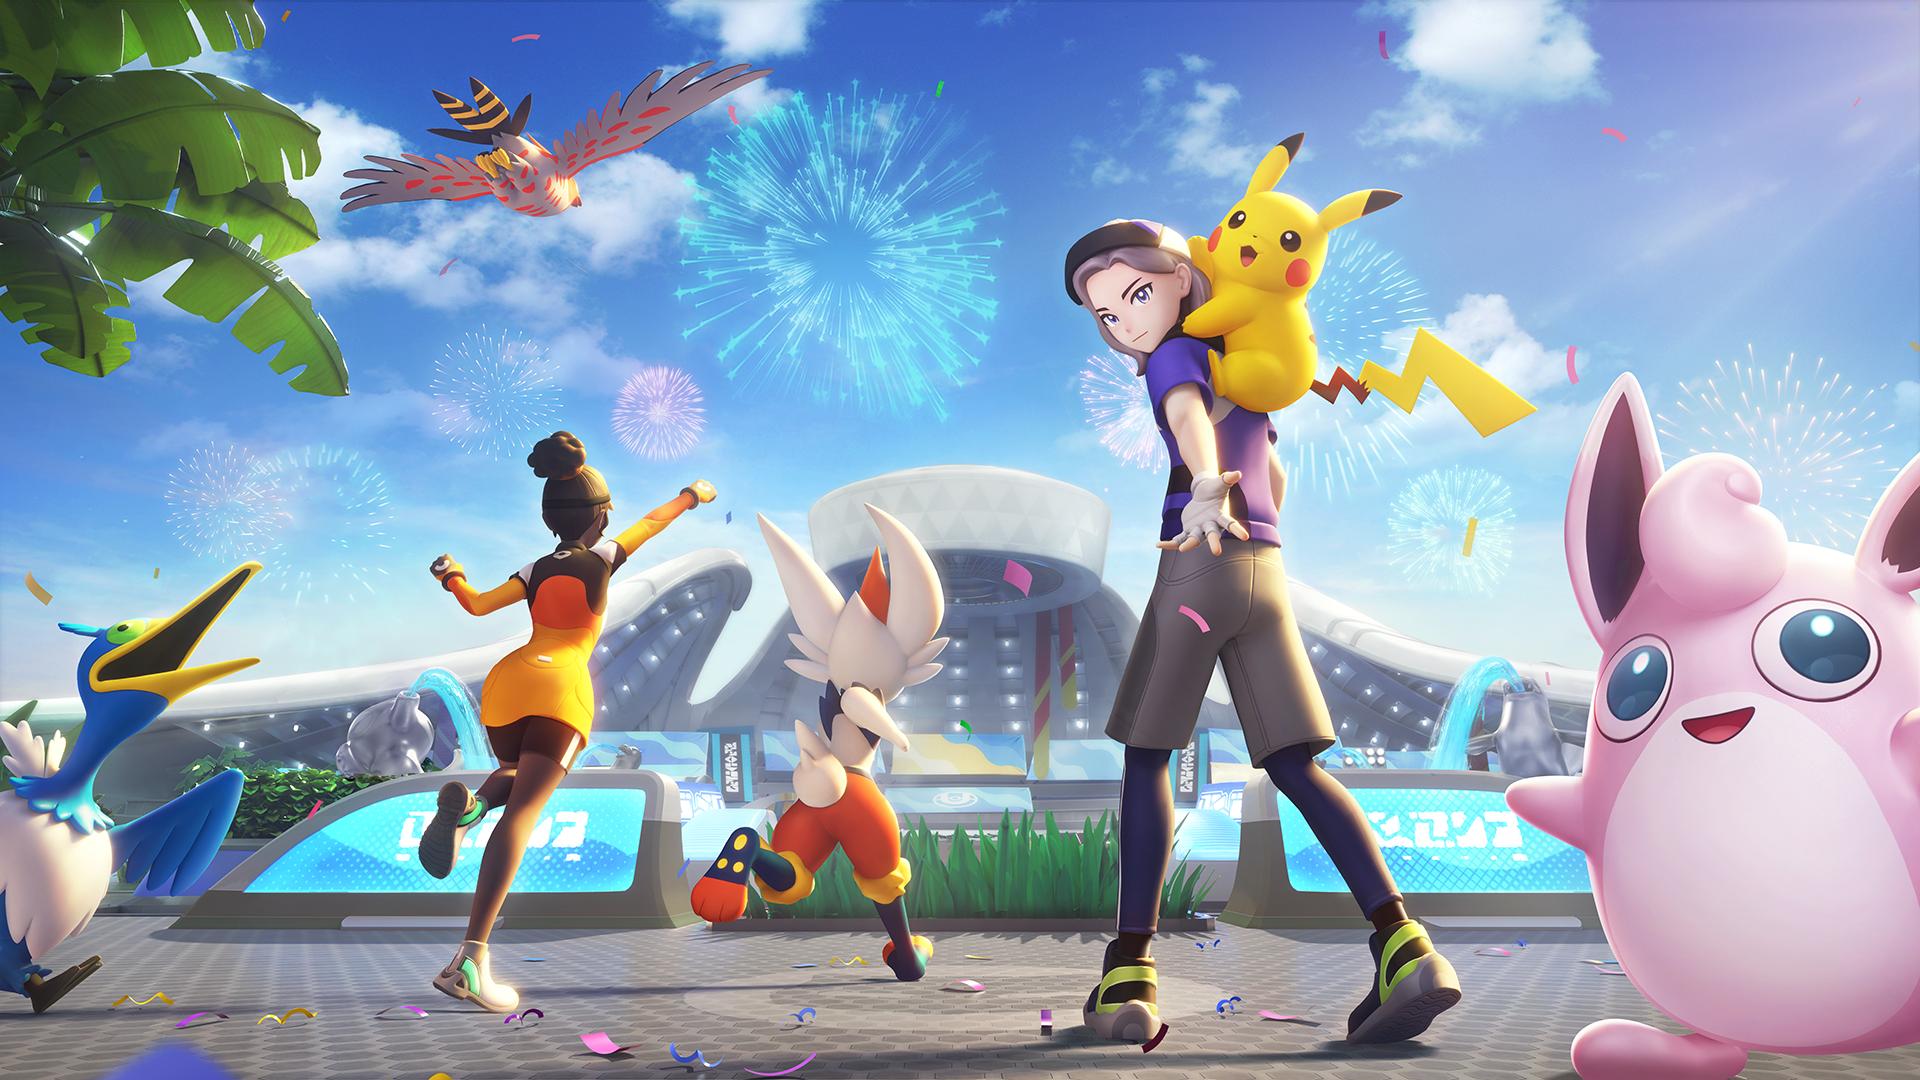 Pokémon Unite artwork